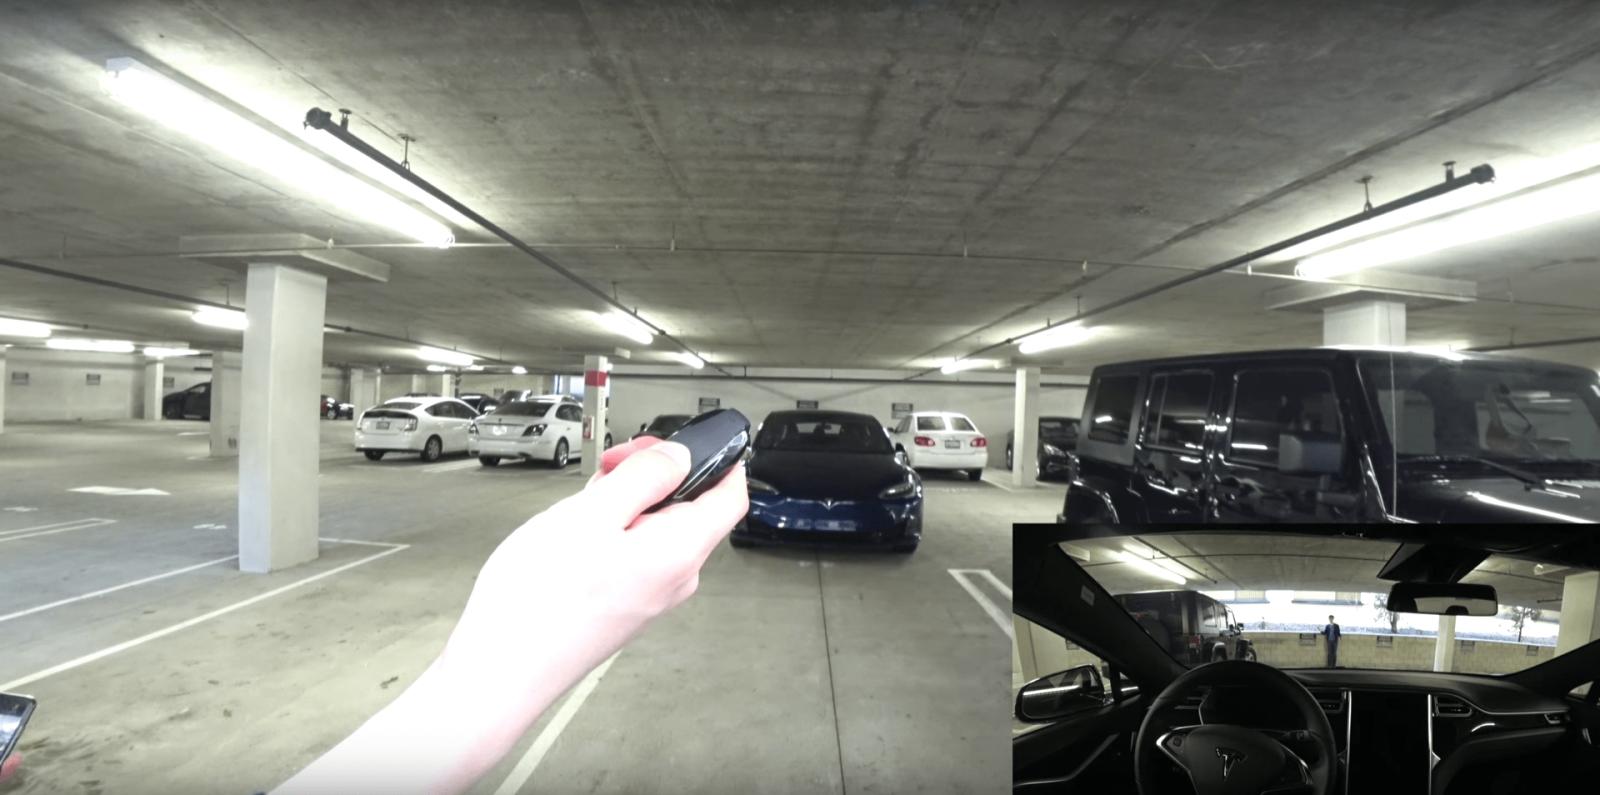 photo image Tesla is getting 'some regulatory pushbacks' over new Autopilot feature, says Elon Musk